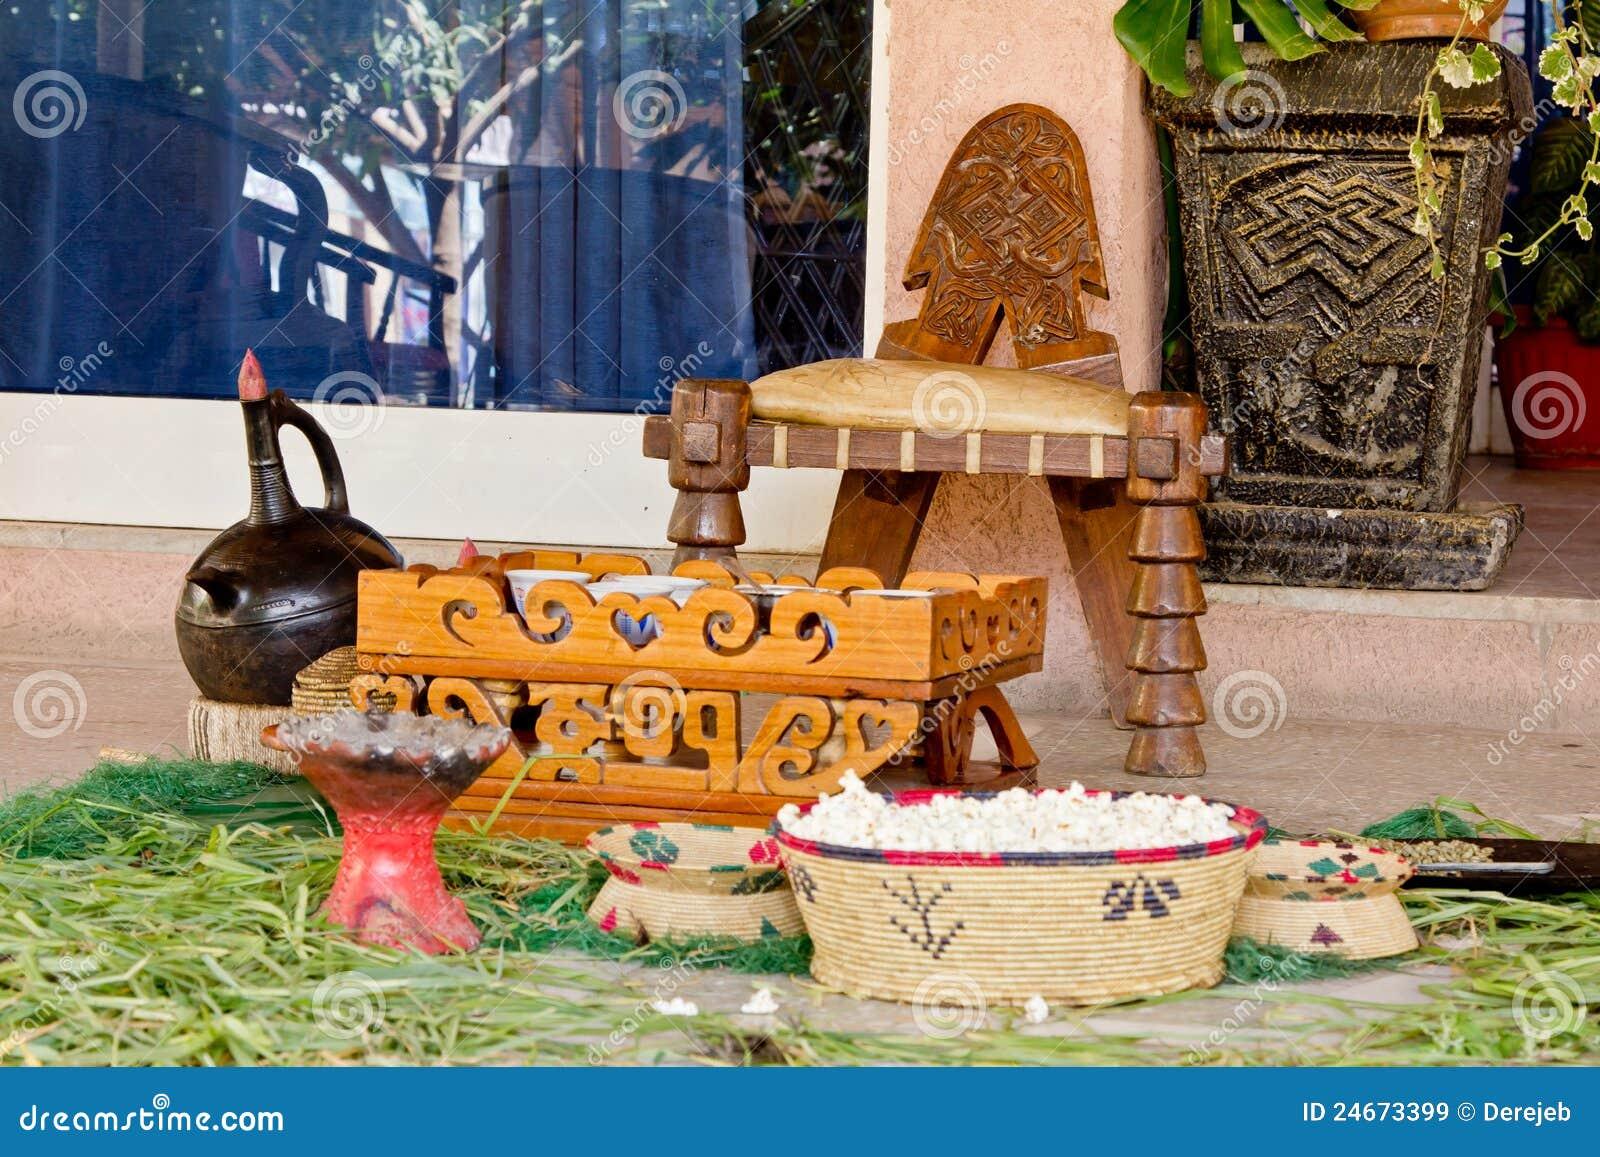 Traditional Ethiopian Coffee Setup Royalty Free Stock Images Image 24673399